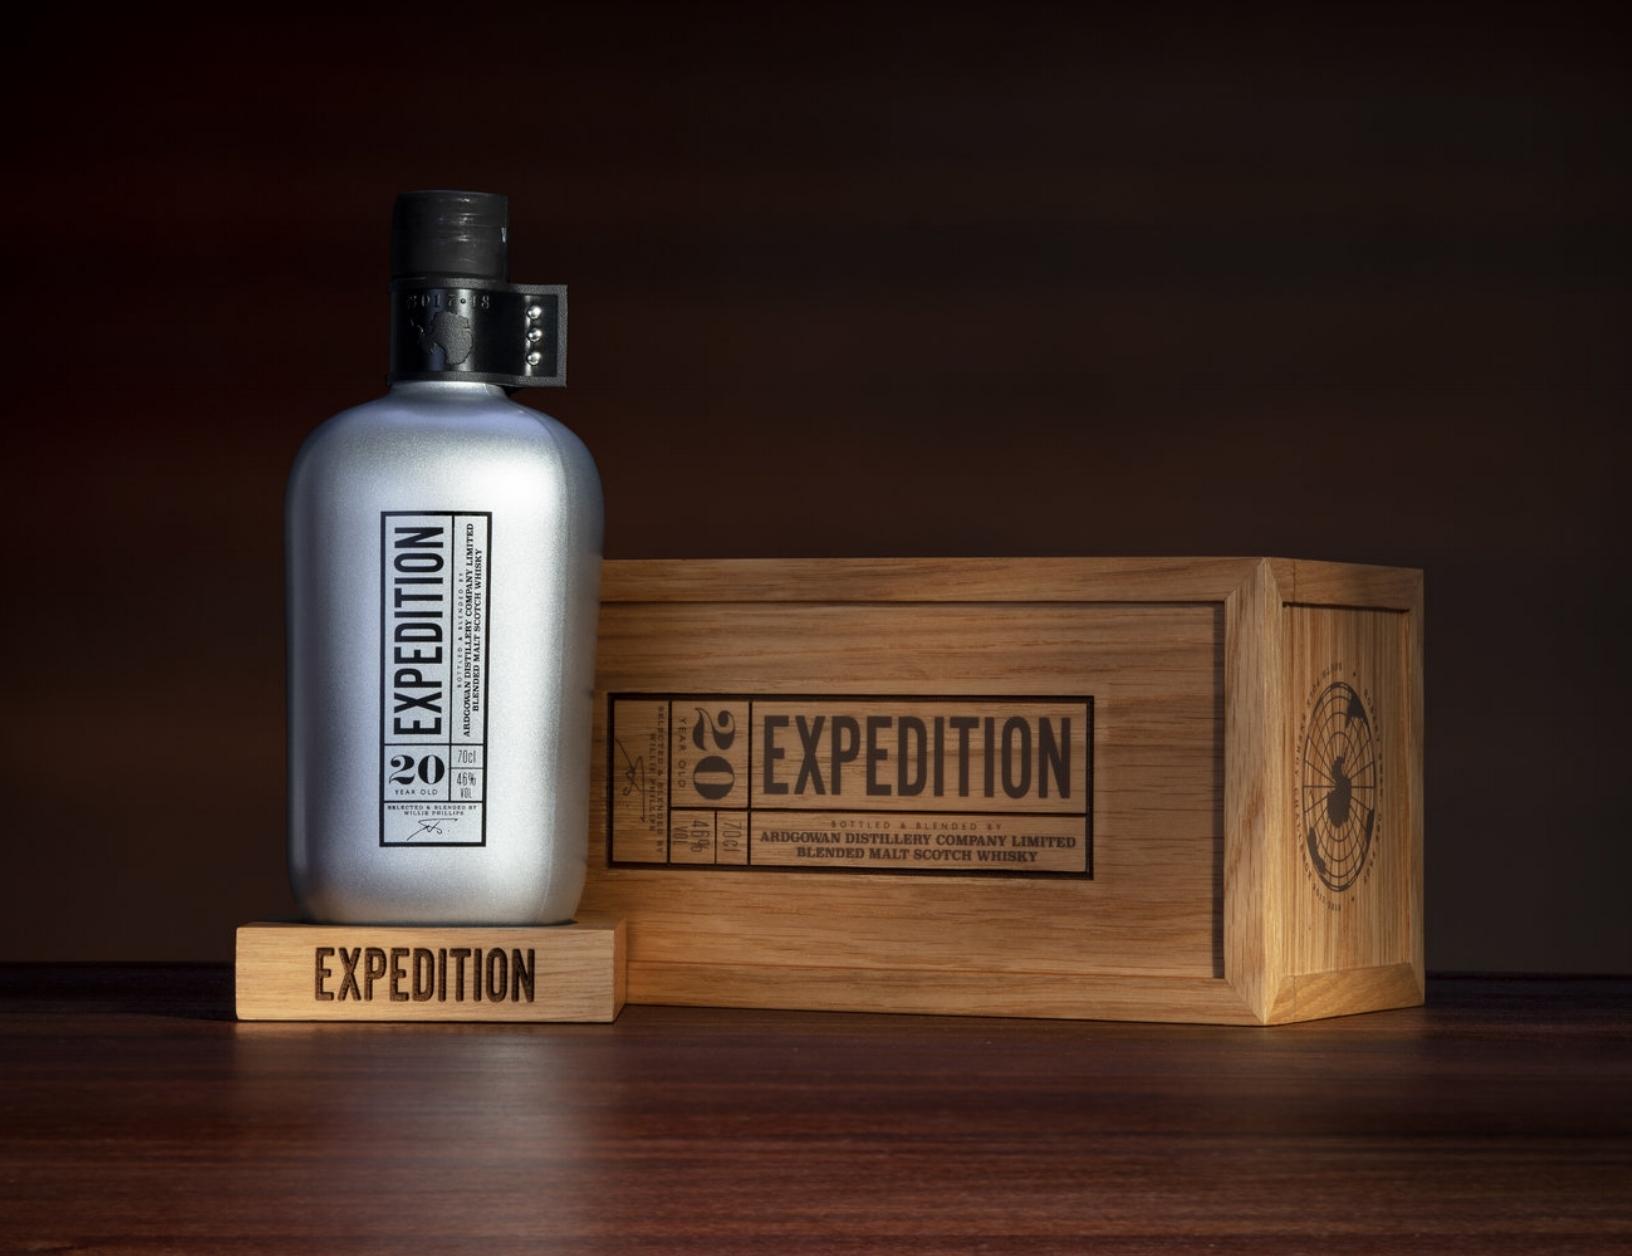 expedition box closed.jpg